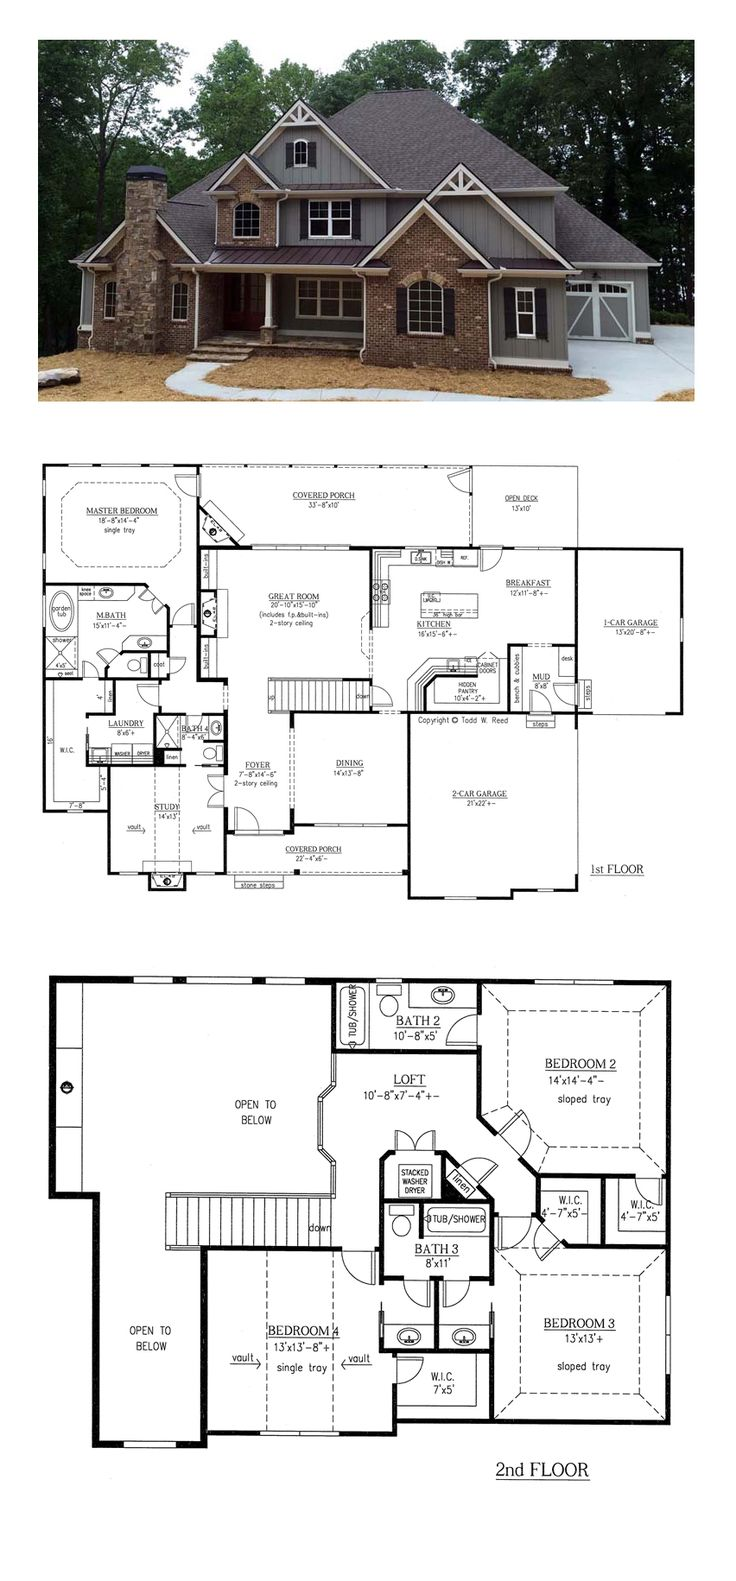 Best 25+ Dream house plans ideas on Pinterest | House ...